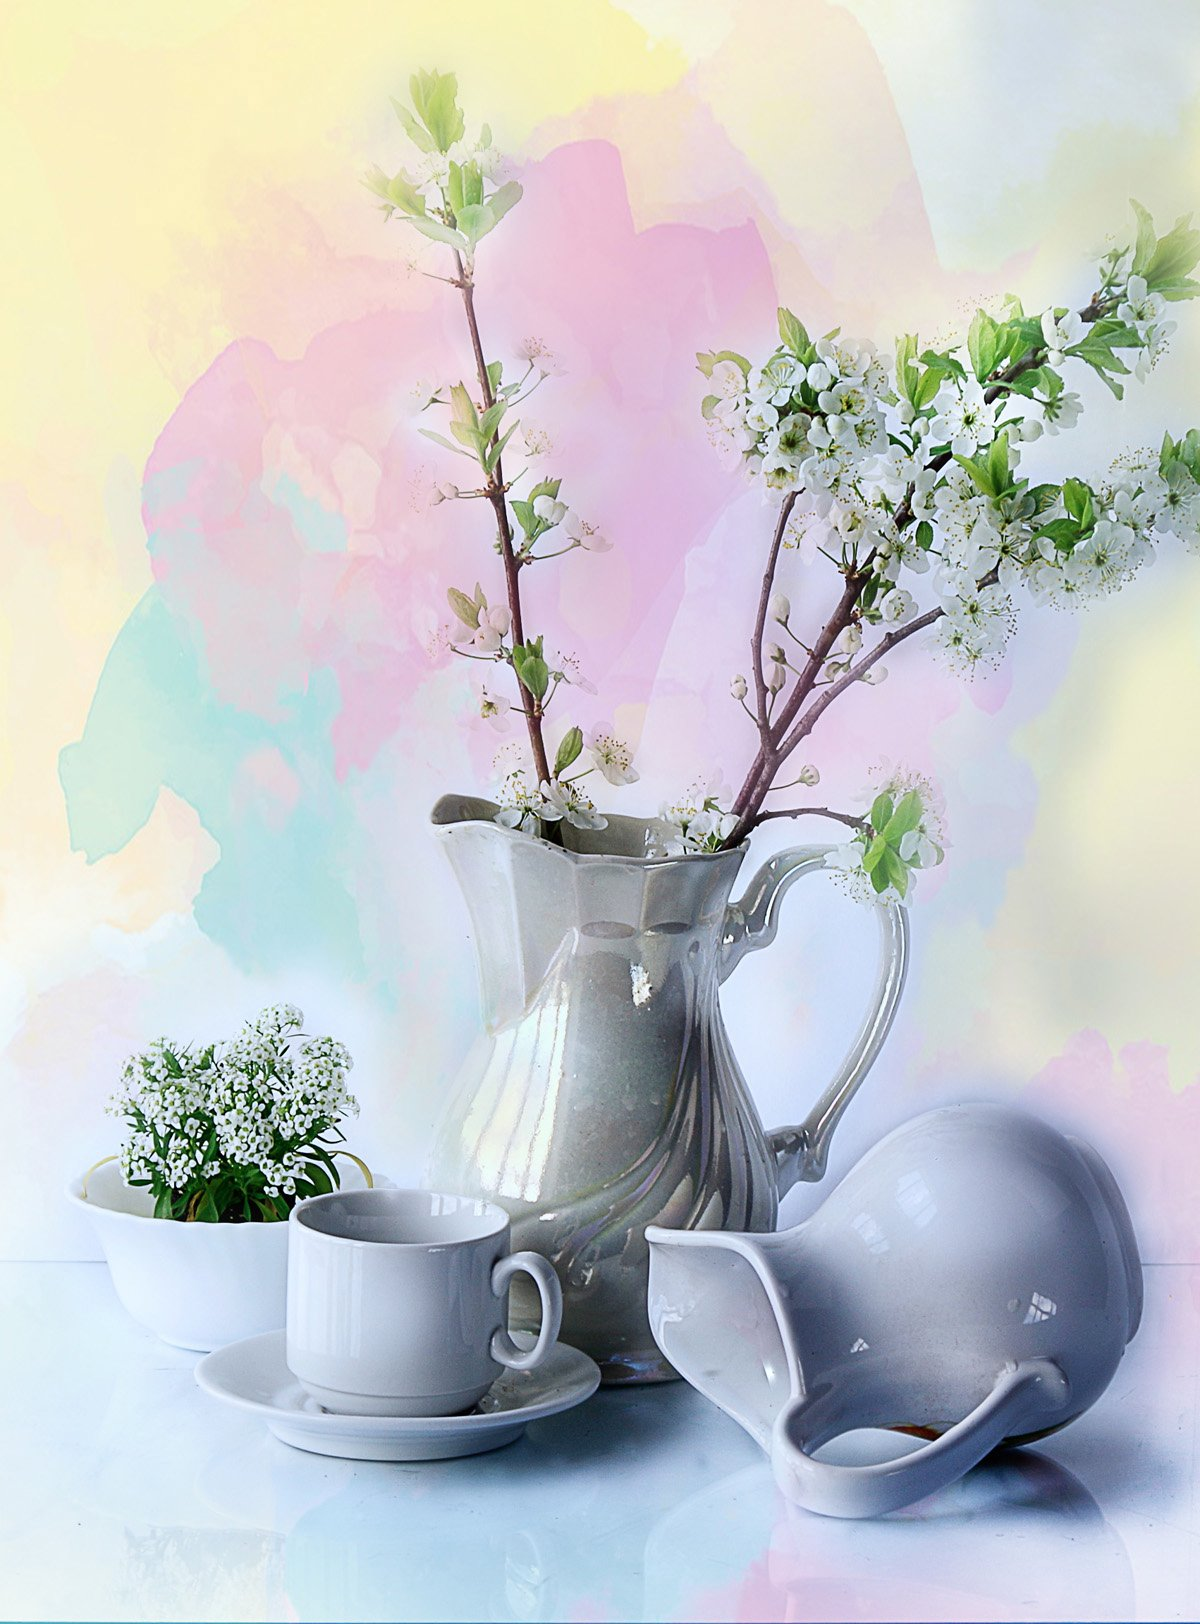 цветы , весна ,, Вера Павлухина